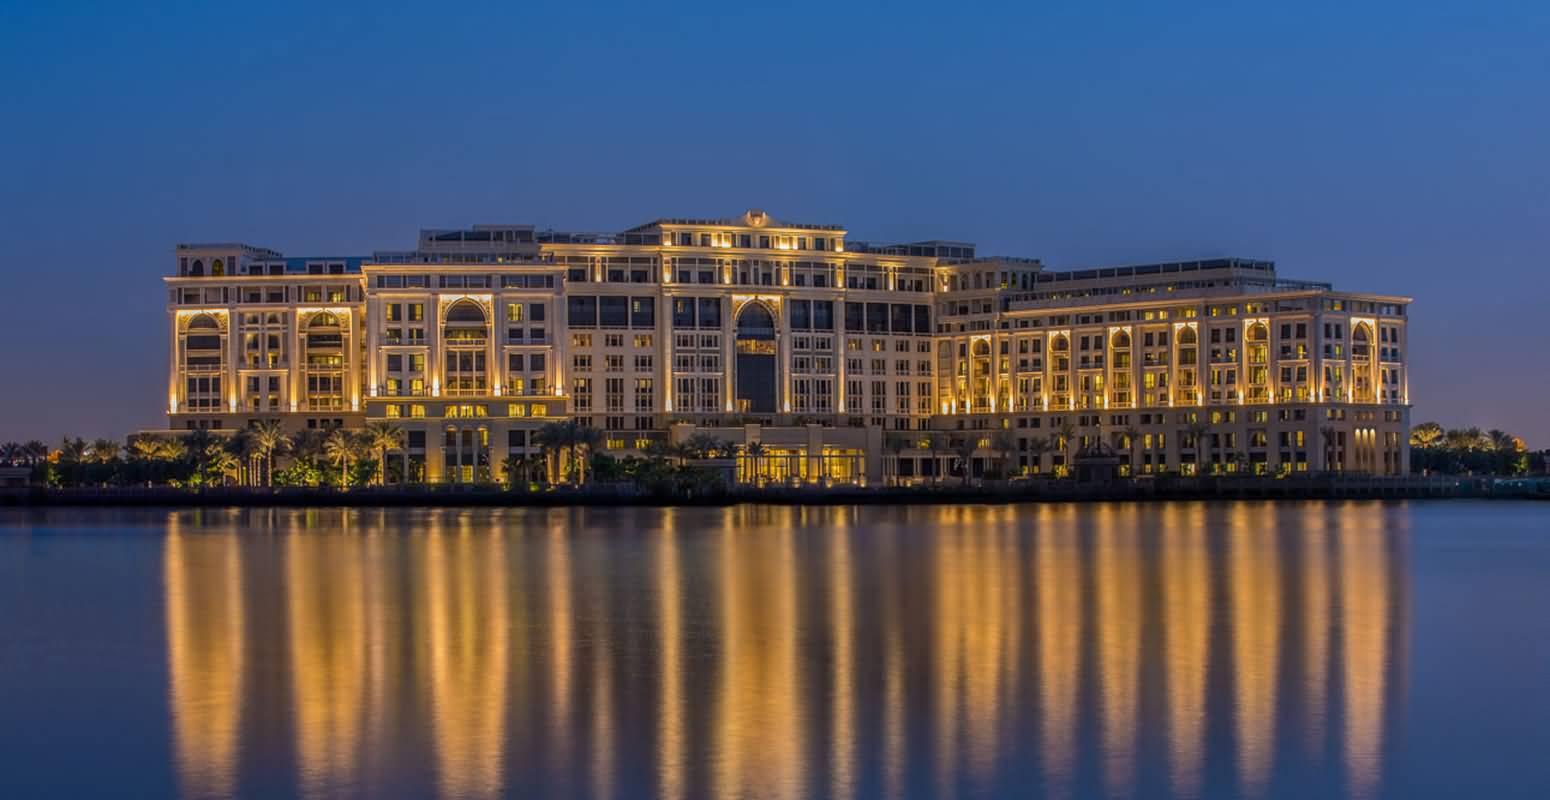 فندق بلازو فيرساتشي – الجداف